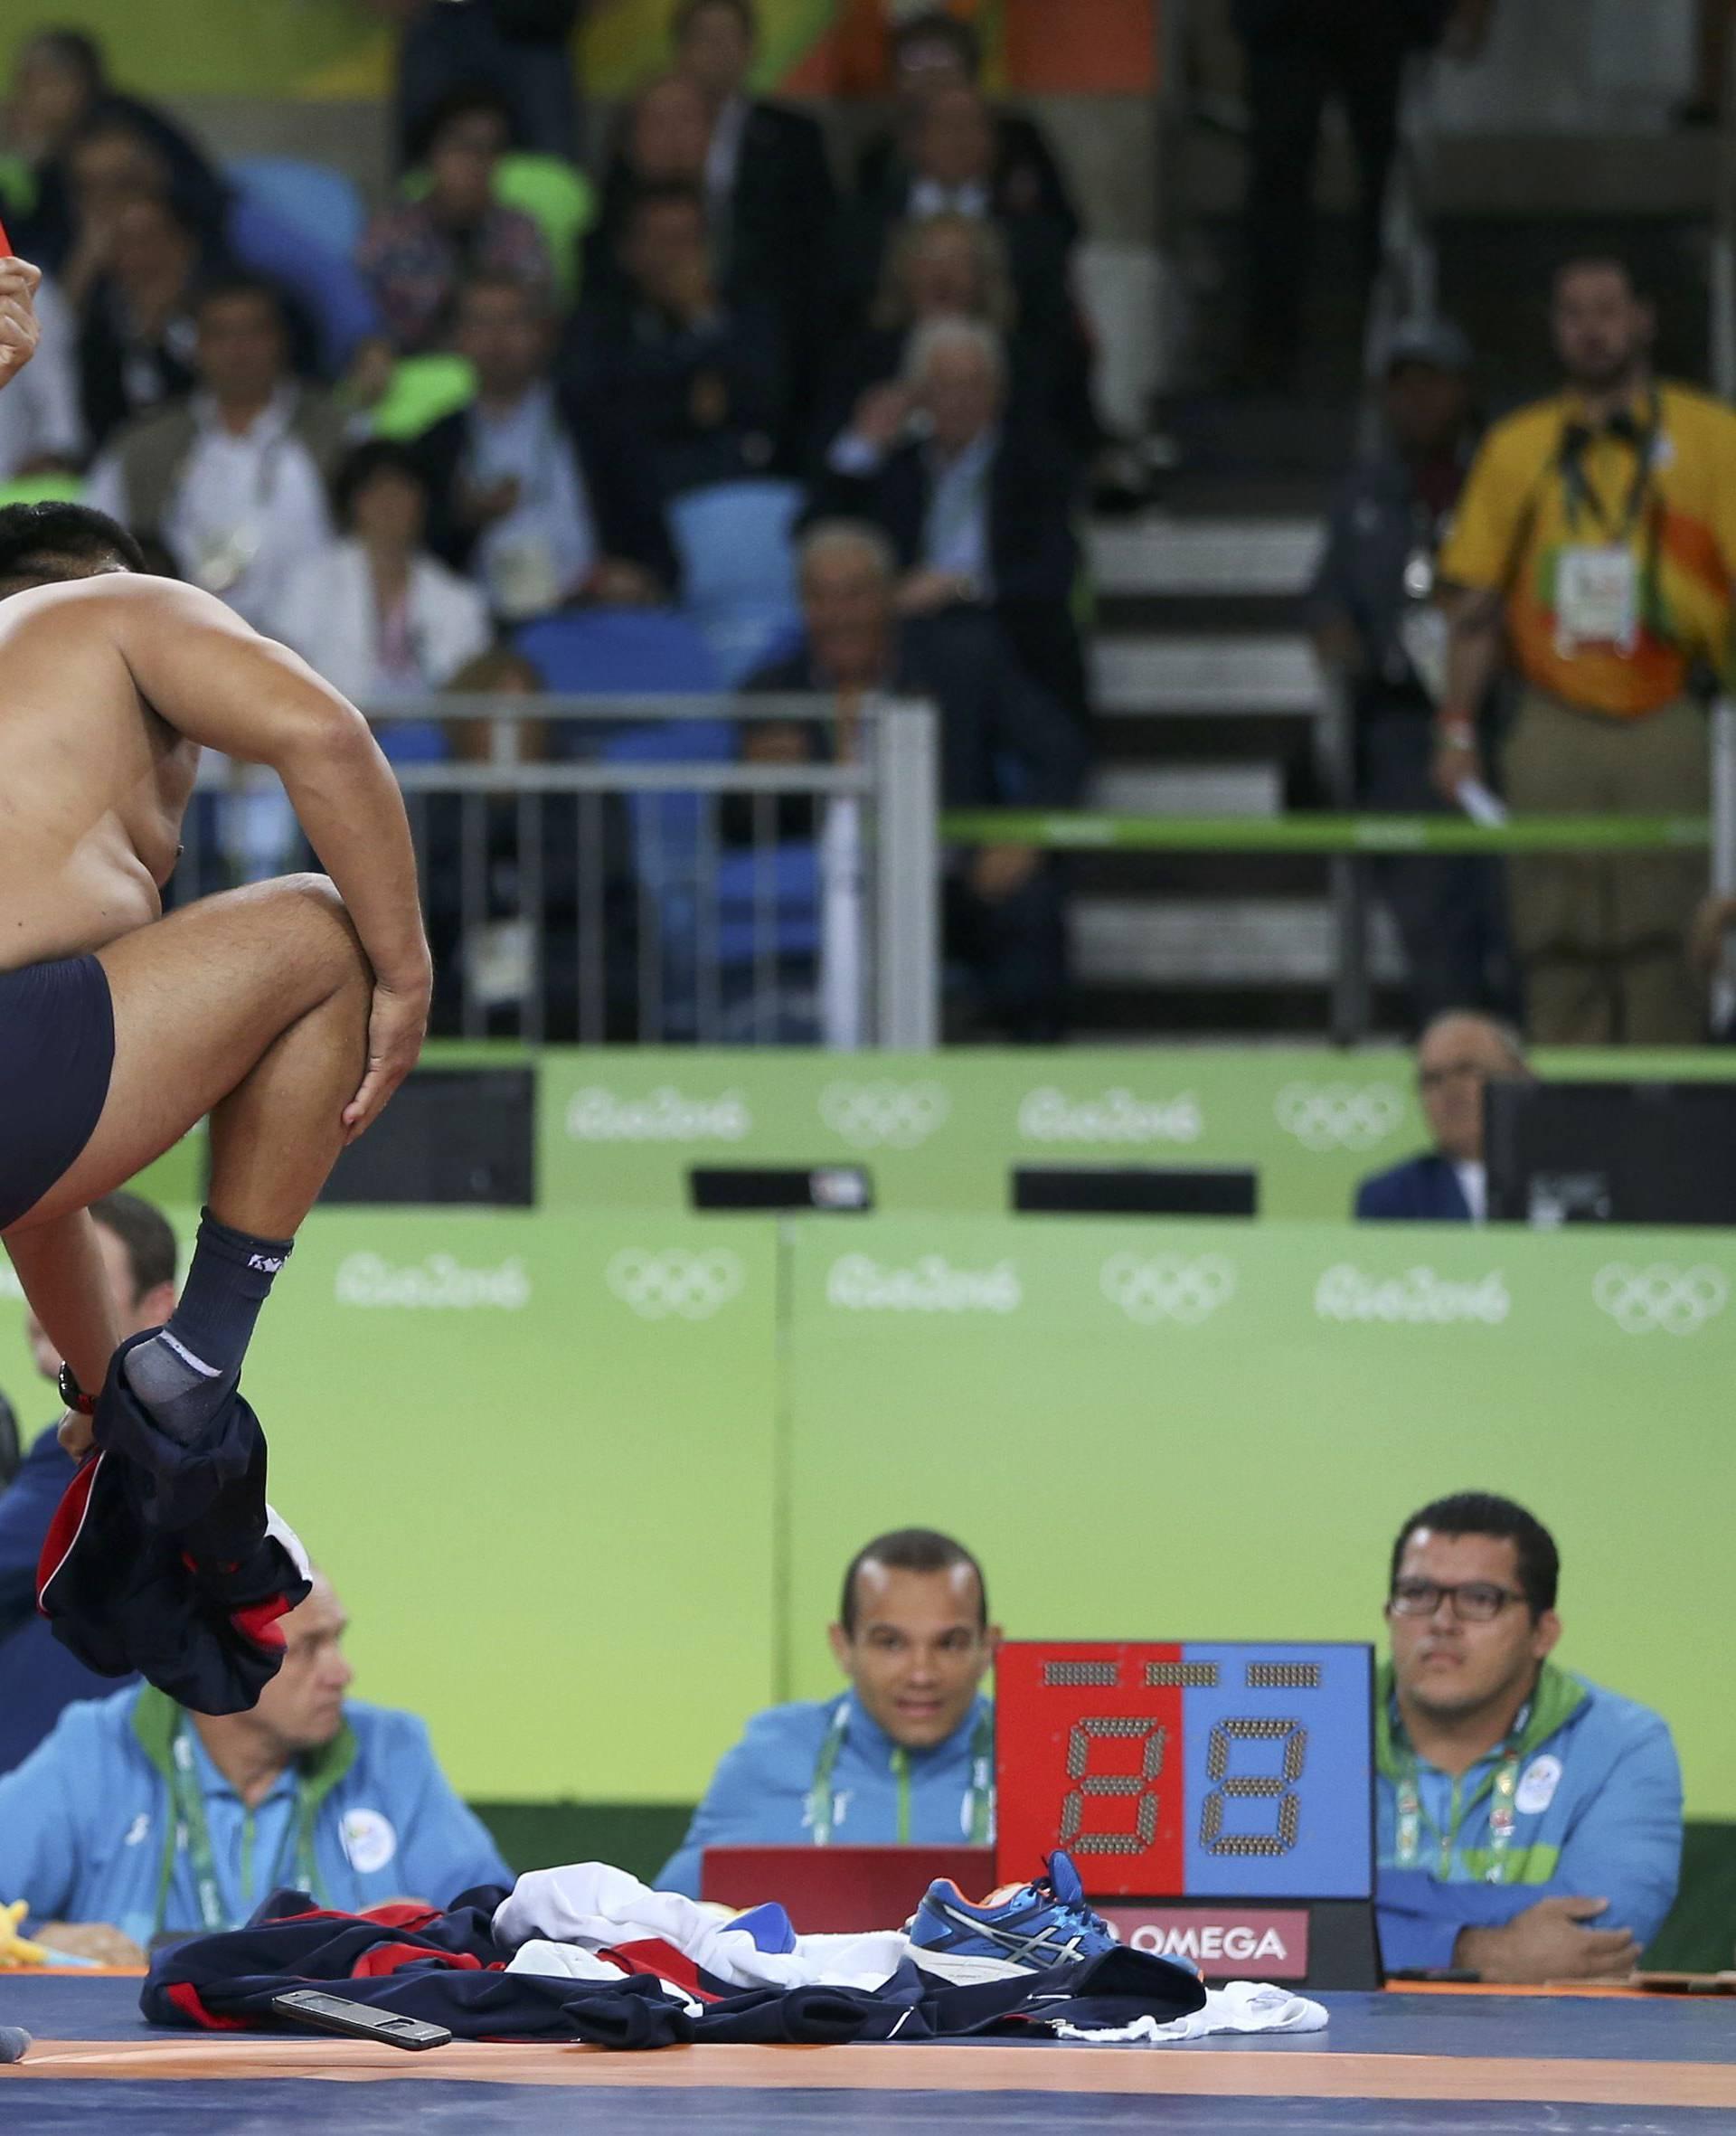 Wrestling - Men's Freestyle 65 kg Bronze